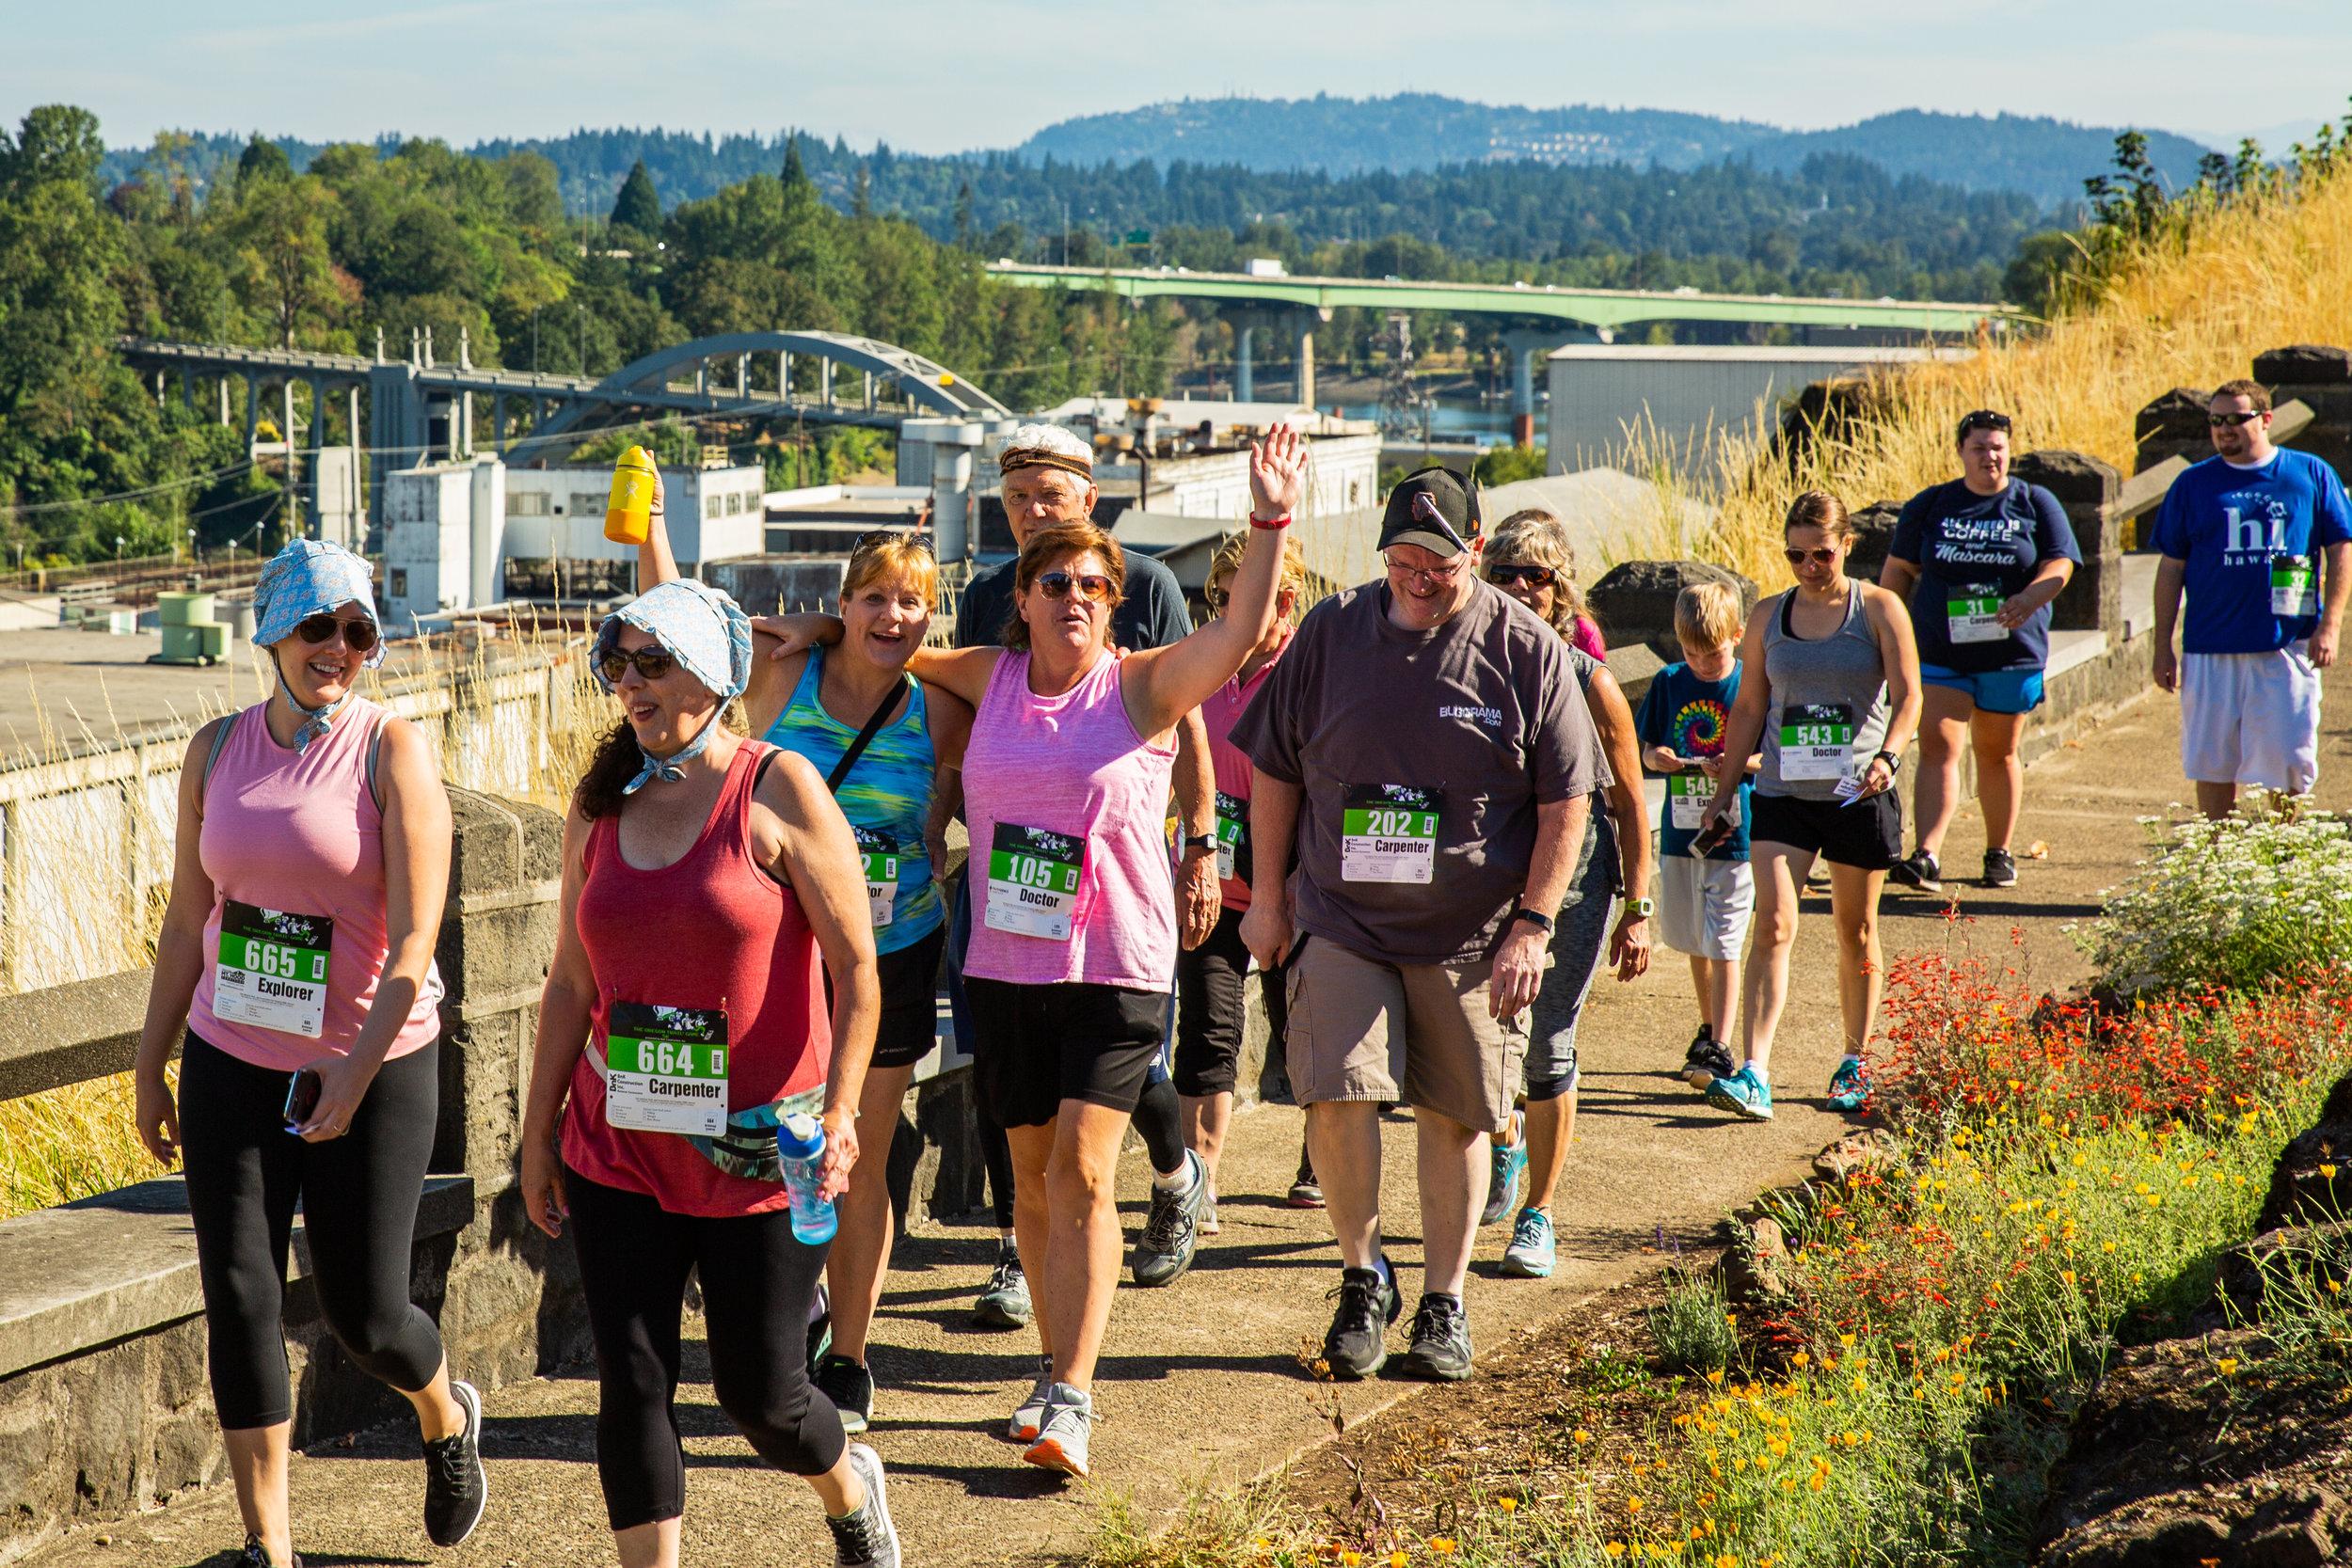 080518-Downtown-Oregon-City-5K-Run-Final-Selects-HR-7.jpg